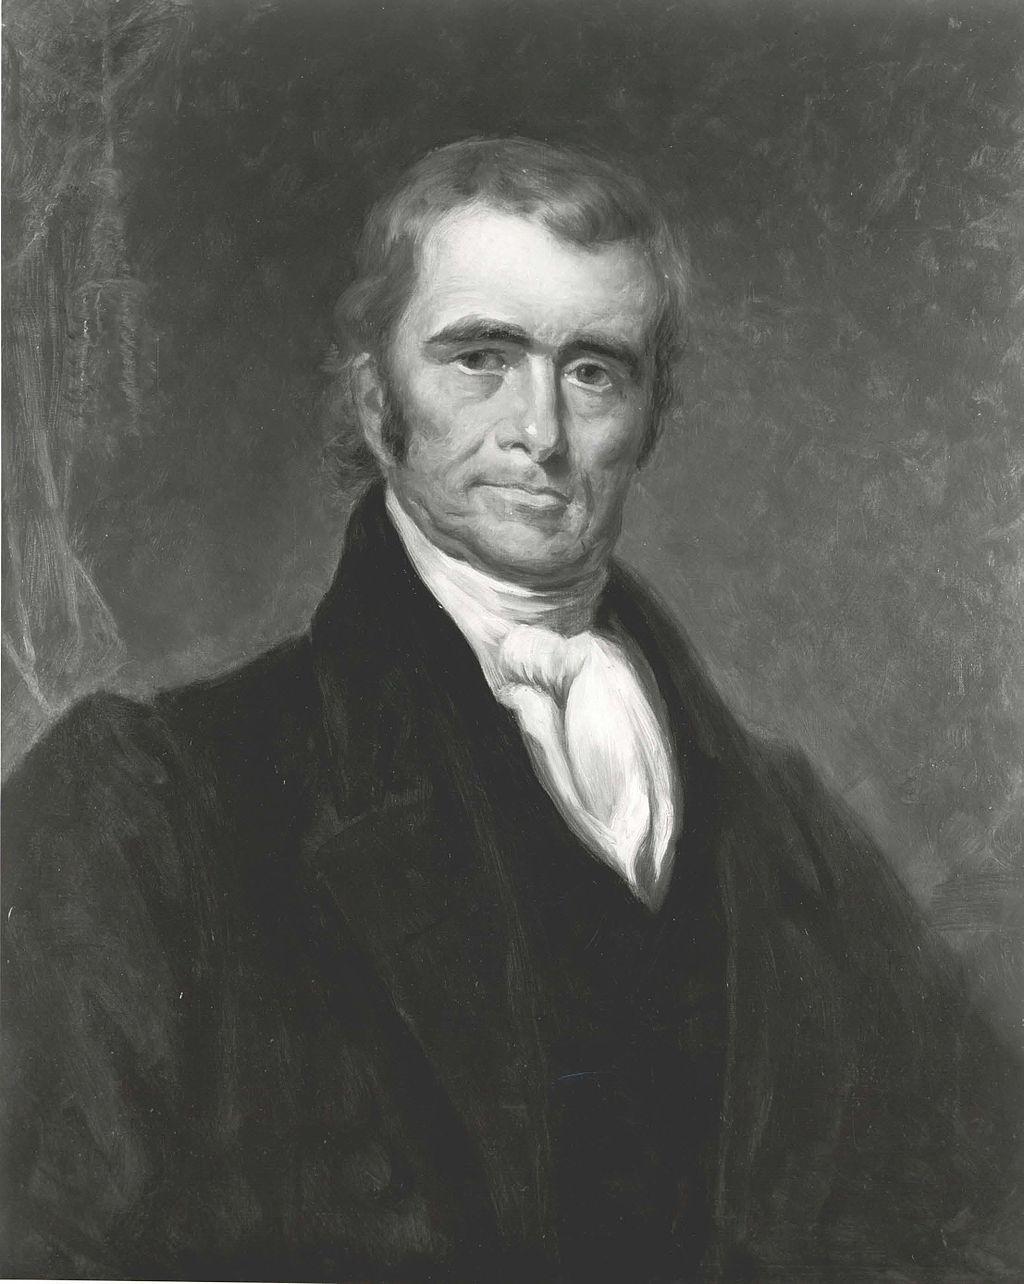 1024px-John_Marshall,_U.S._Secretary_of_State